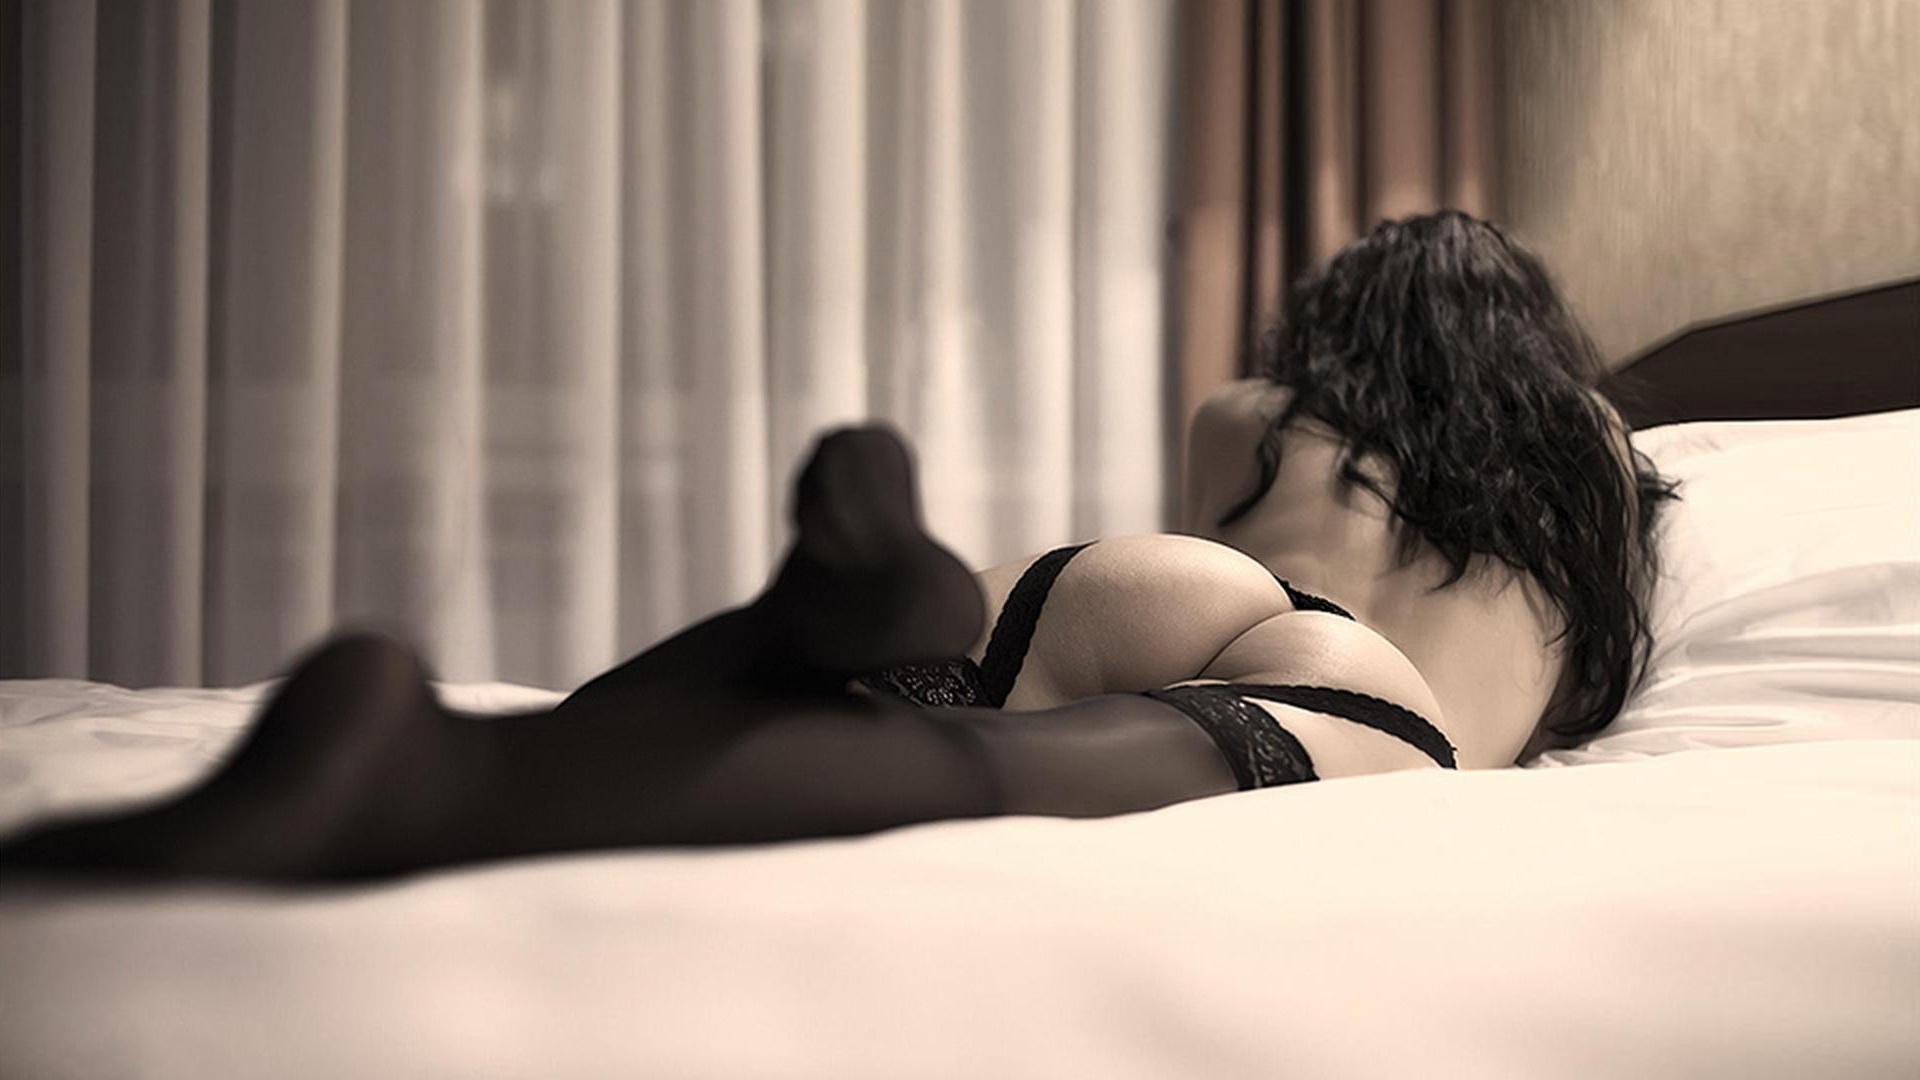 Swimsuit Rihanna Goes Nude Photos